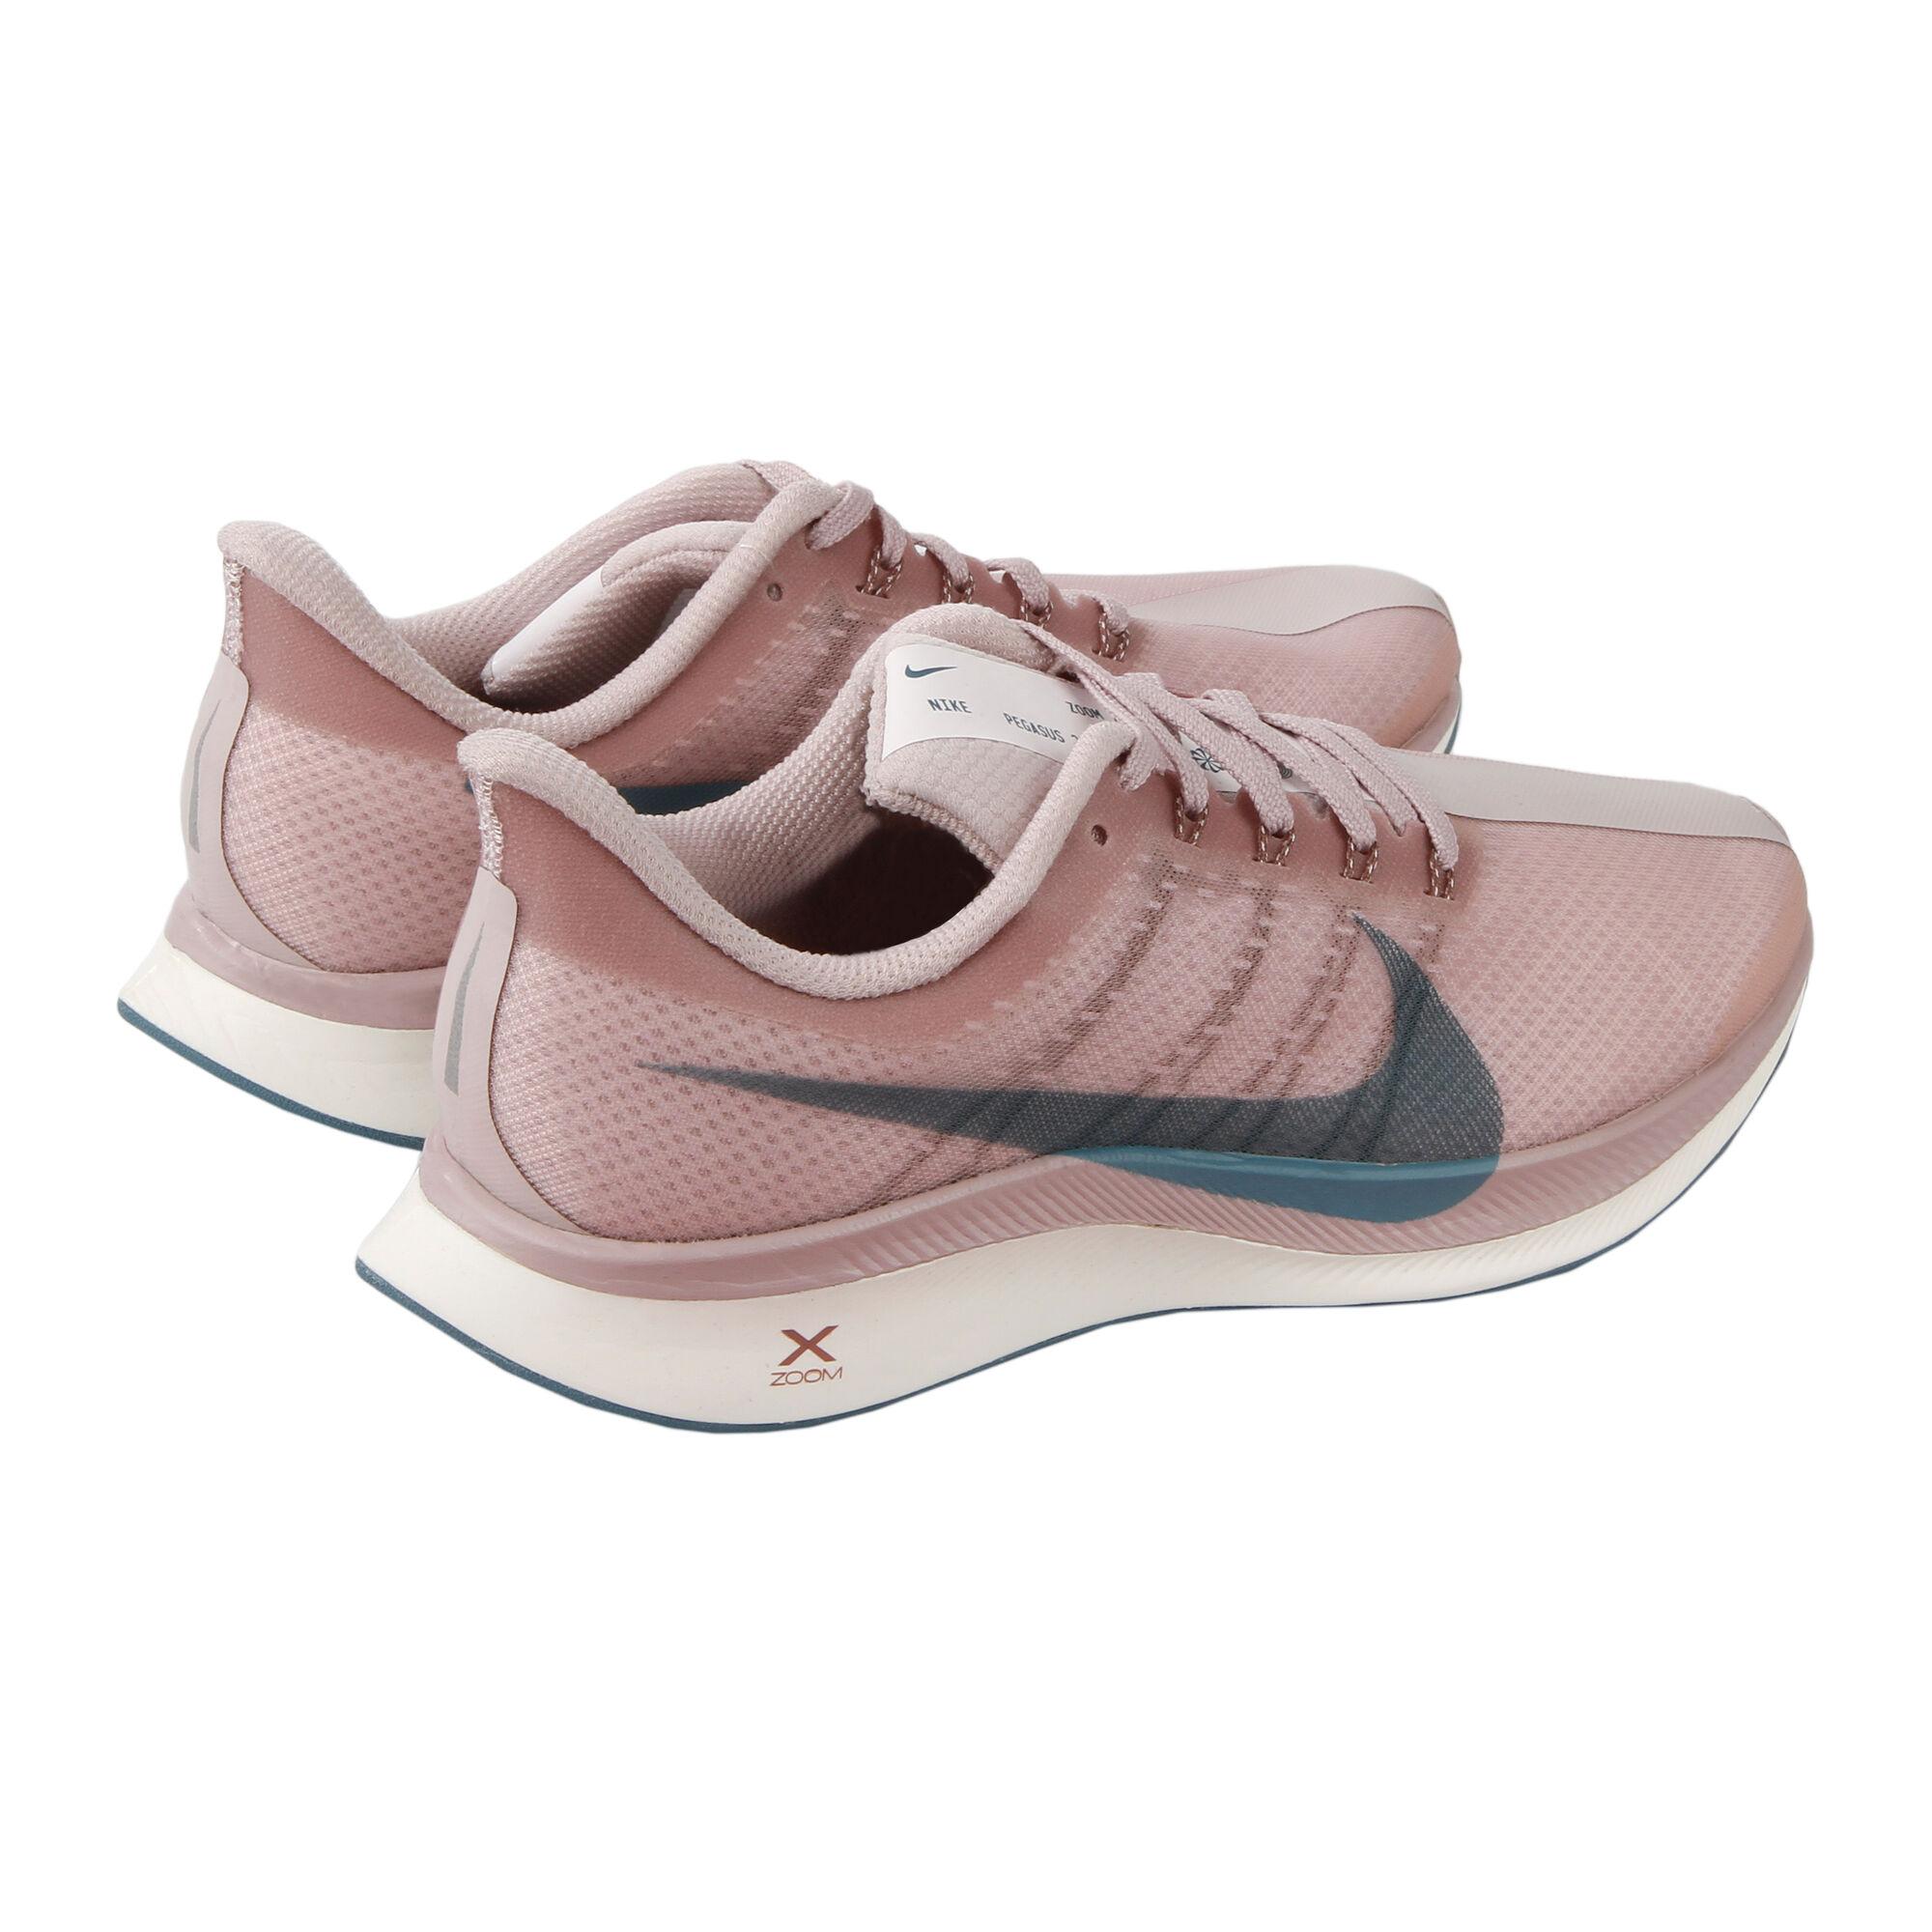 e2ddc20ec Nike · Nike · Nike · Nike · Nike · Nike · Nike · Nike · Nike. Zoom Pegasus  35 Turbo Women ...